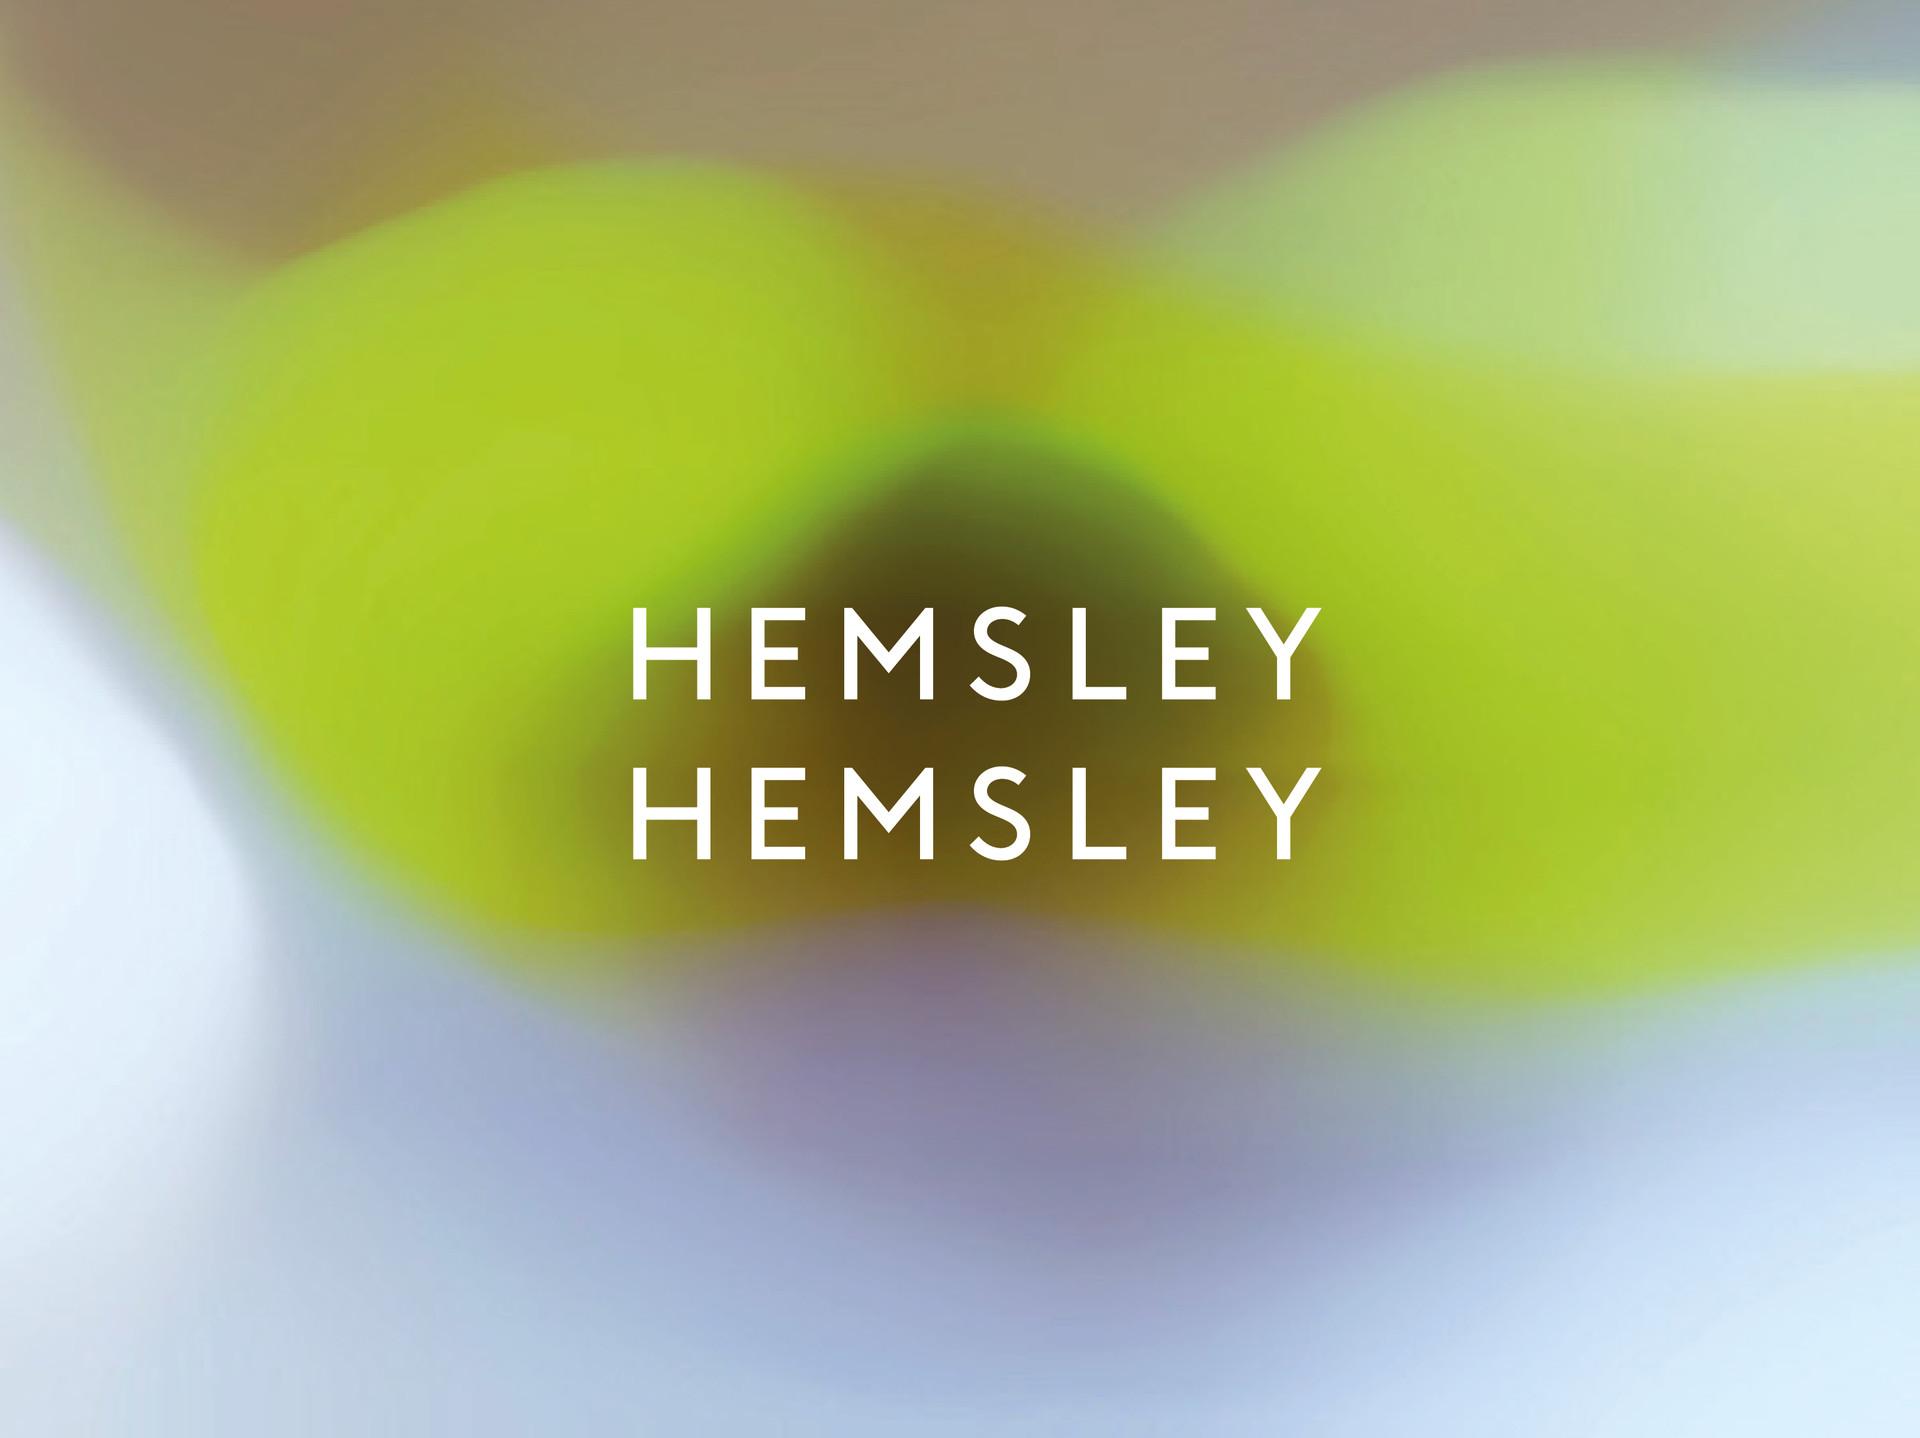 Hemsley + Hemsley